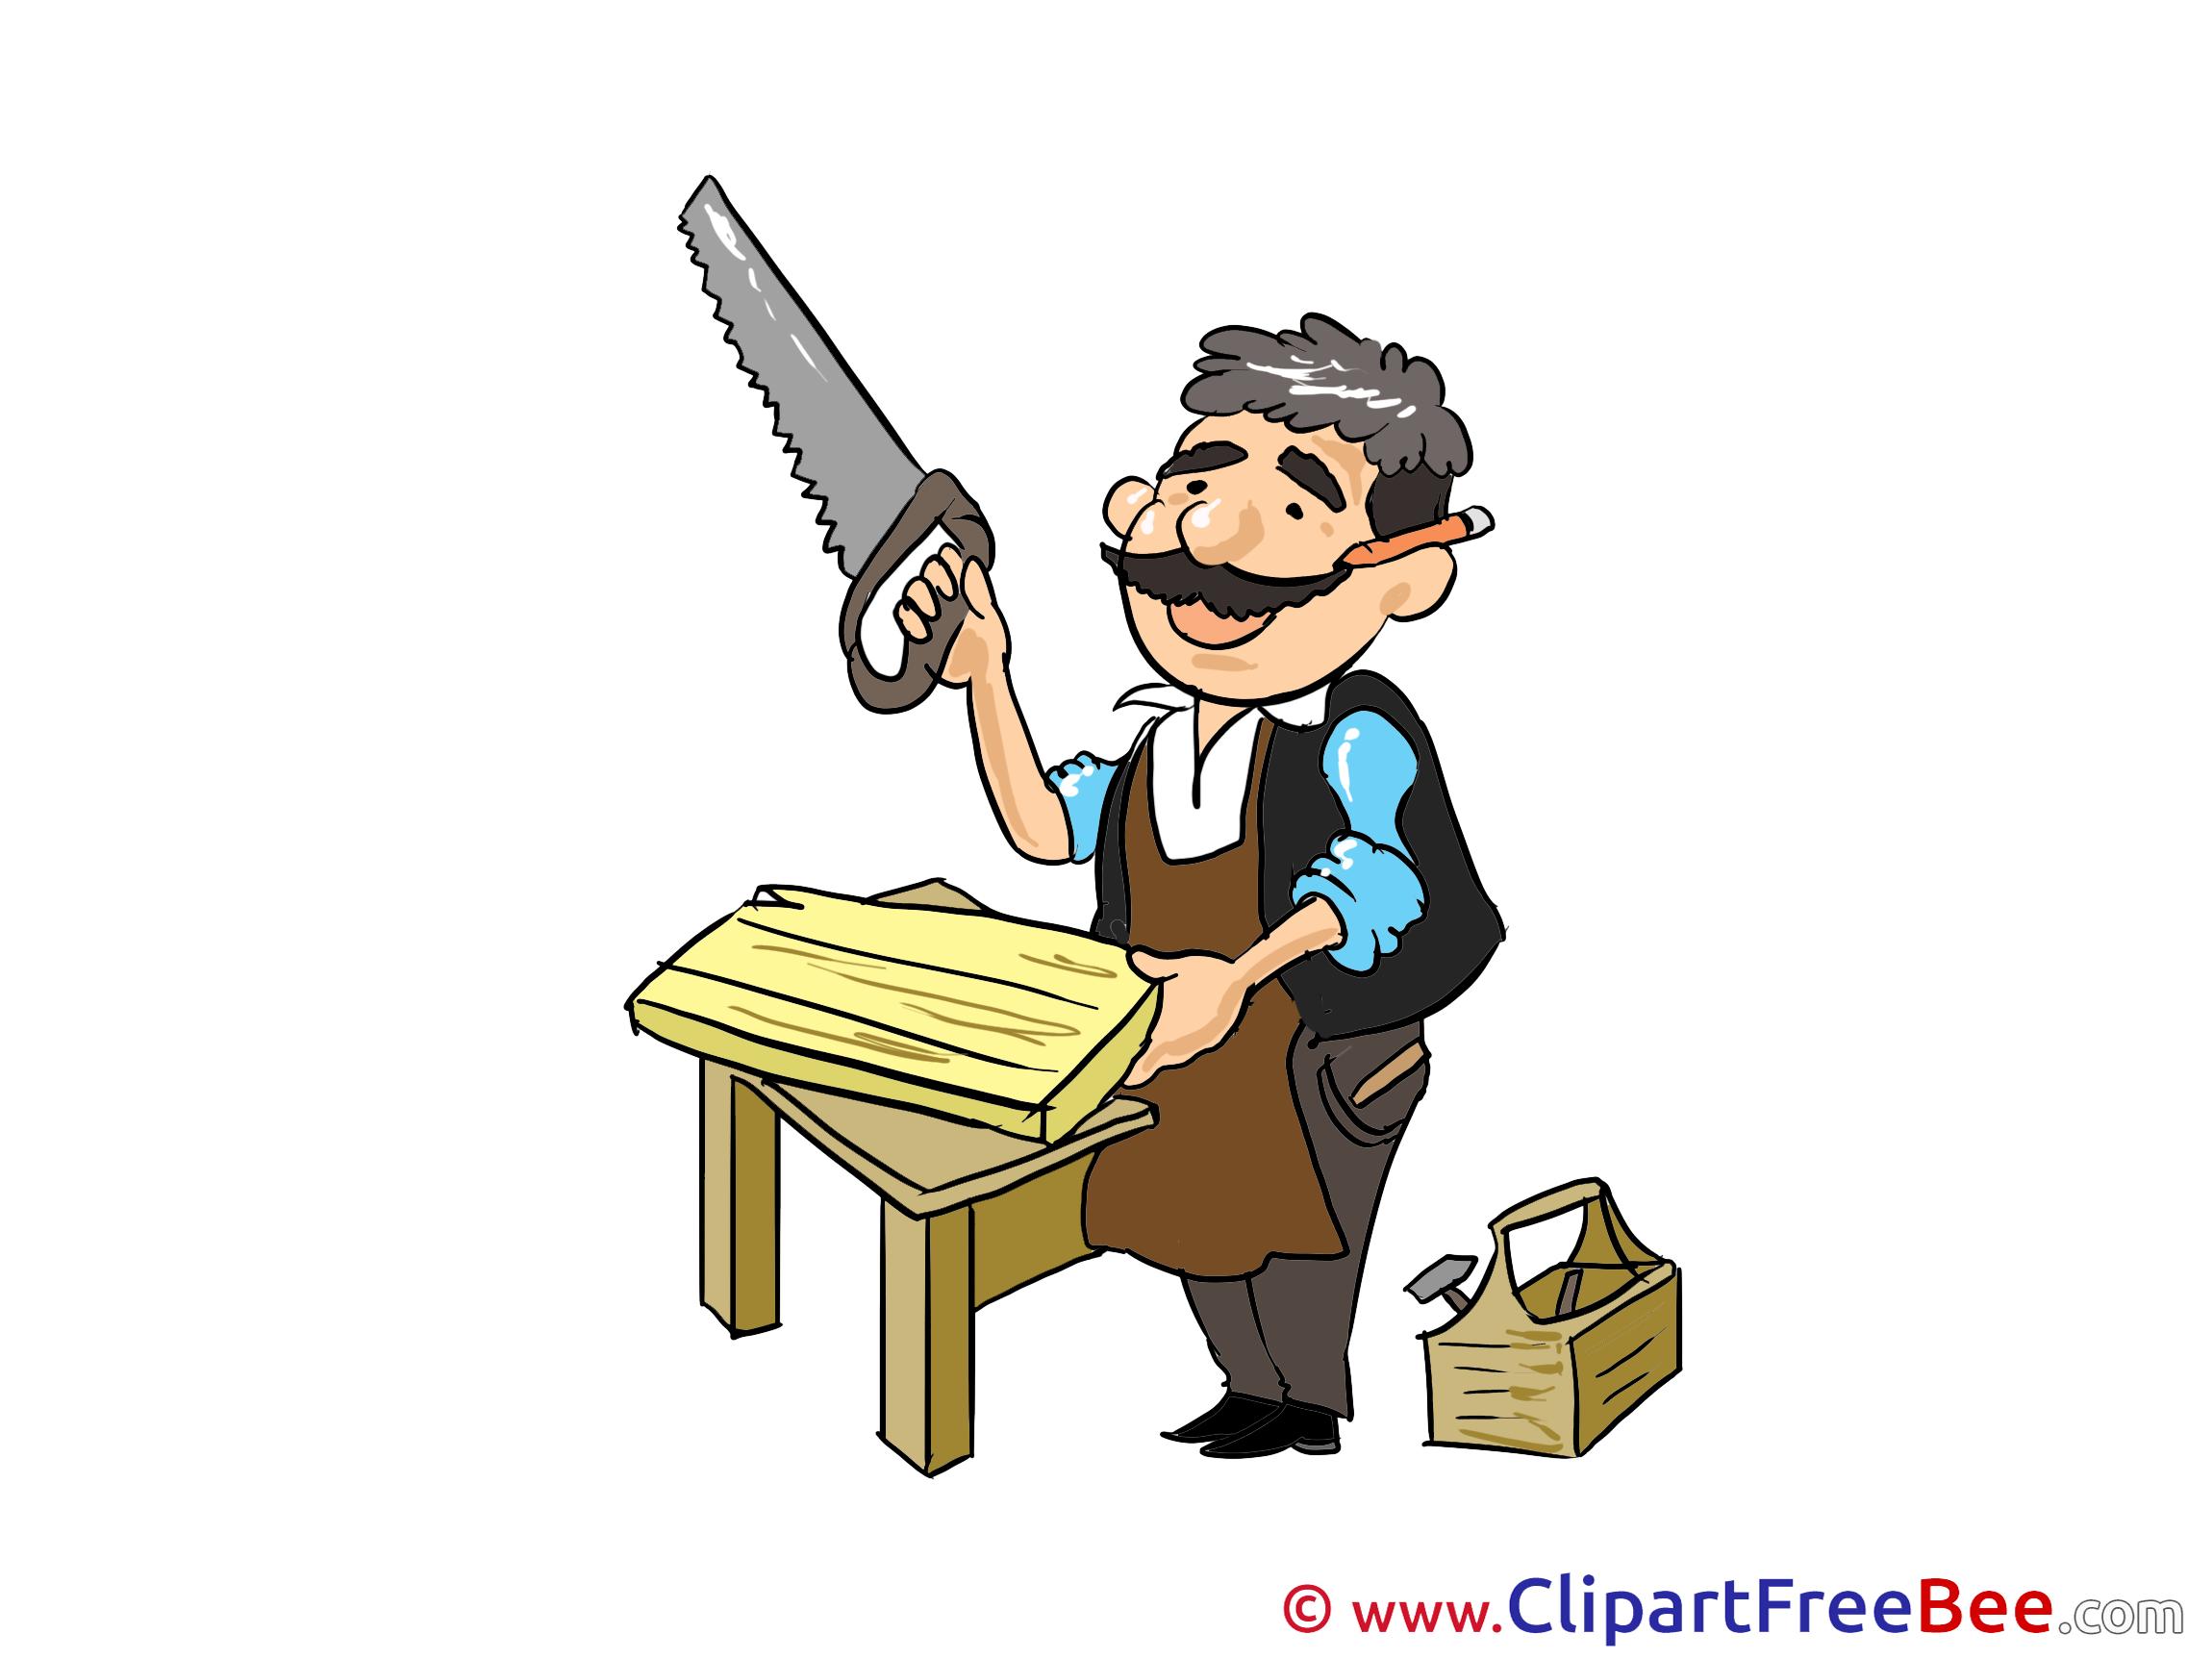 Carpentry clipart clip art. Carpenter cilpart fancy saw